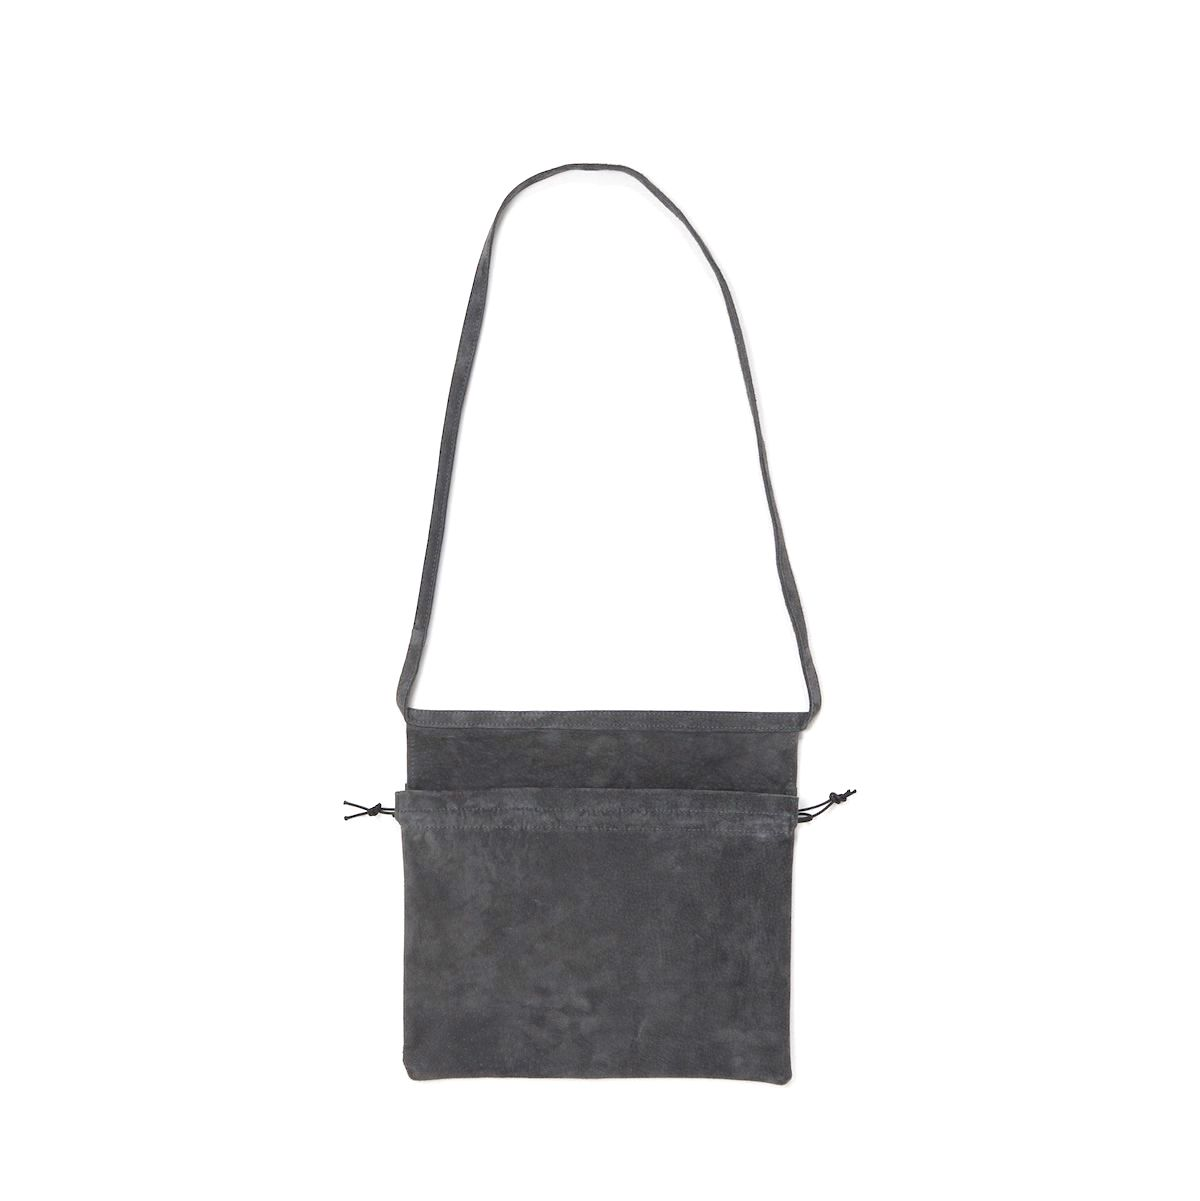 Hender Scheme / red cross bag small Dark Gray